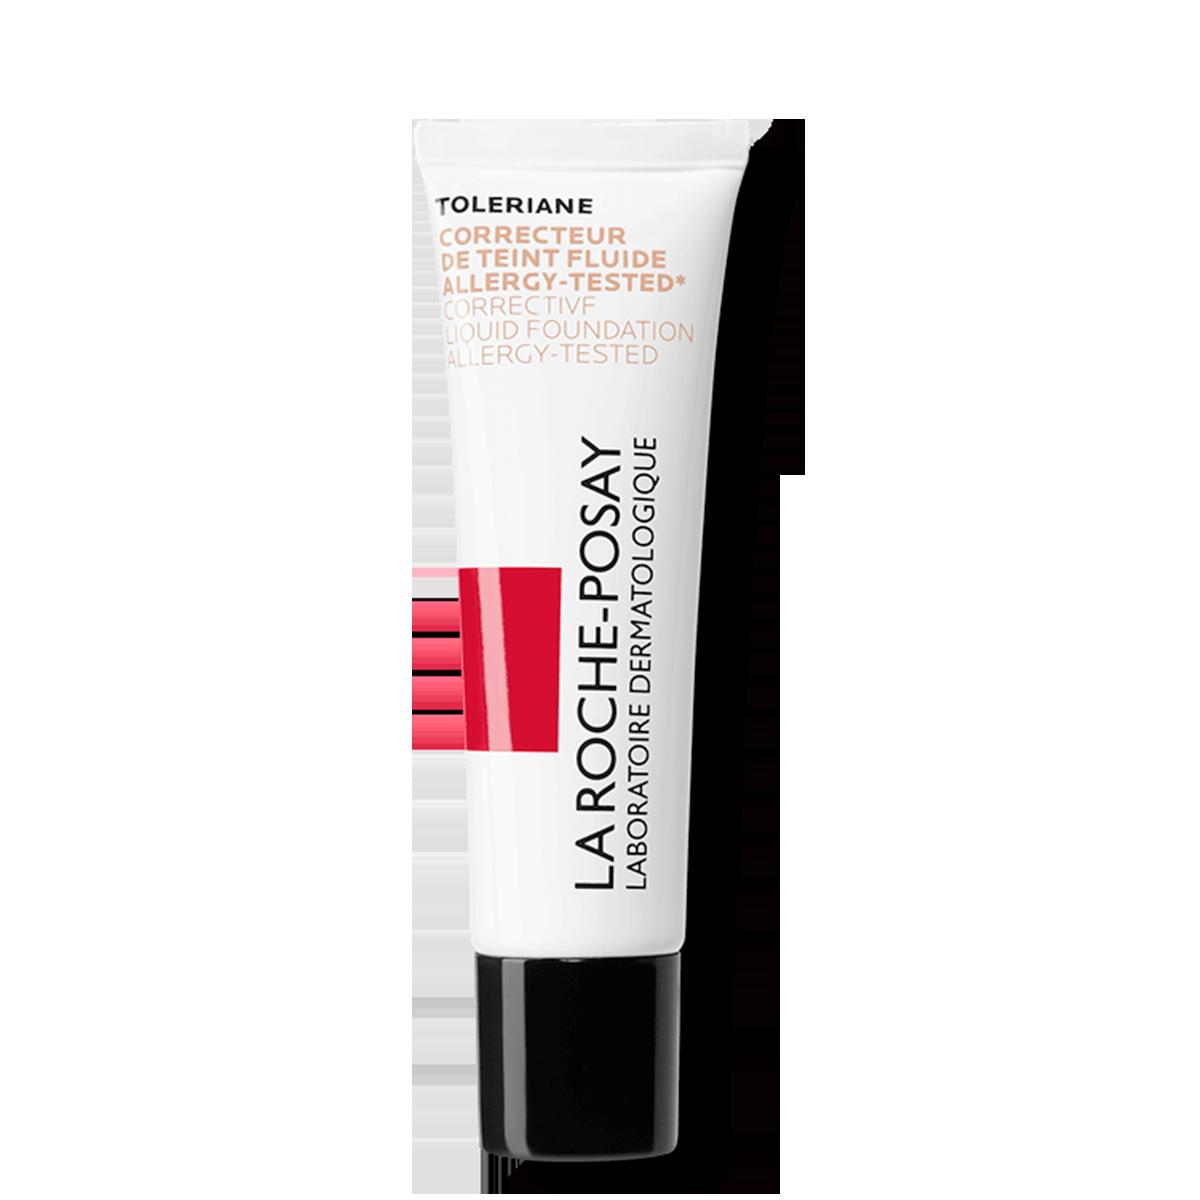 La Roche Posay Herkkä Toleriane Make up CORRECTIVE LIQUID FOUNDATIO